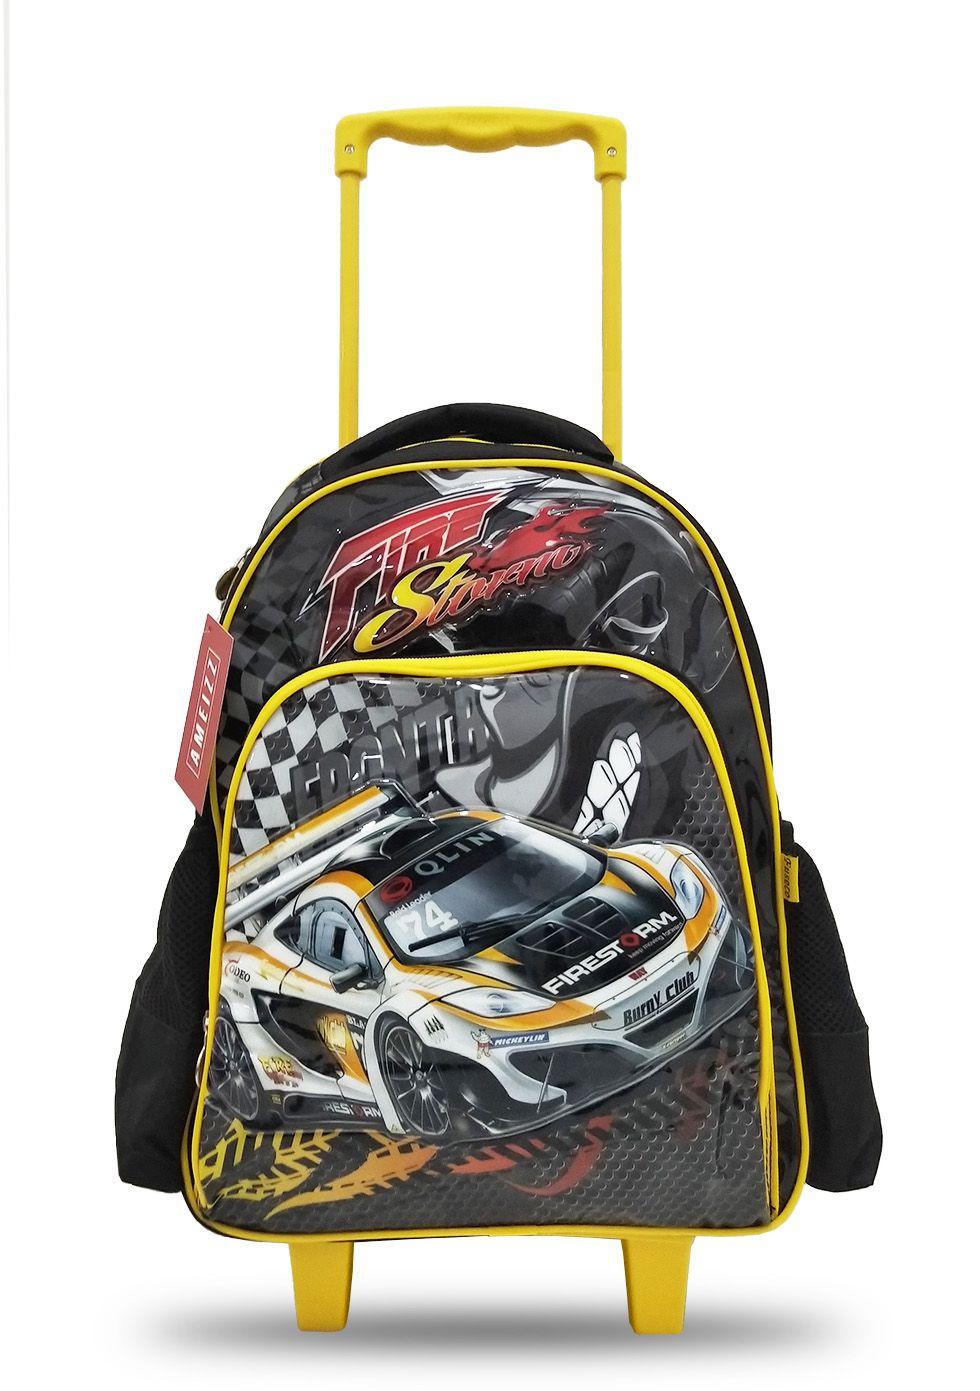 Mochila Escolar Infantil Menino Carro De Corrida 4138 Grande